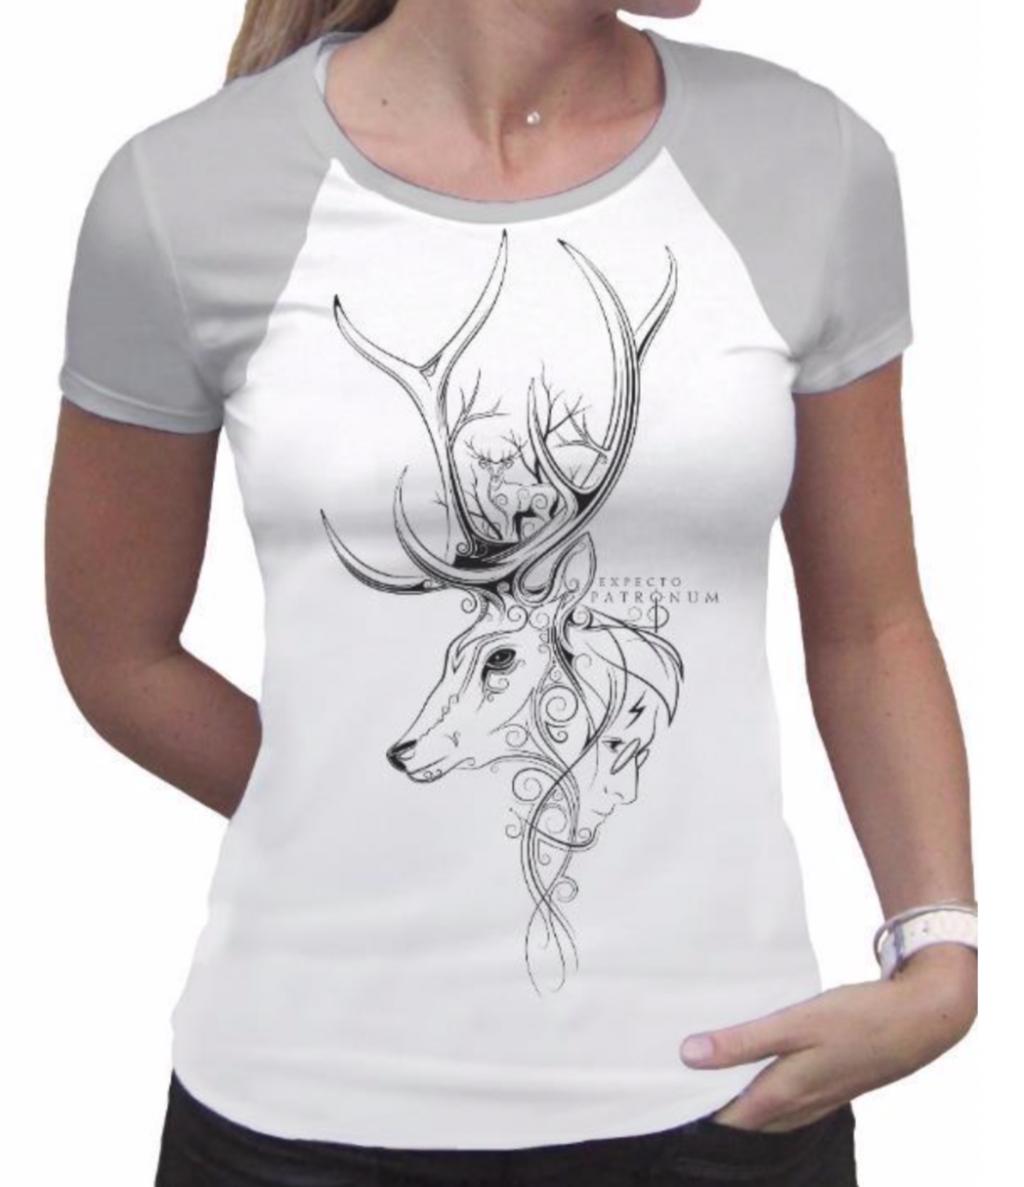 HARRY POTTER - T-Shirt PREMIUM Patronus White & Grey (M)